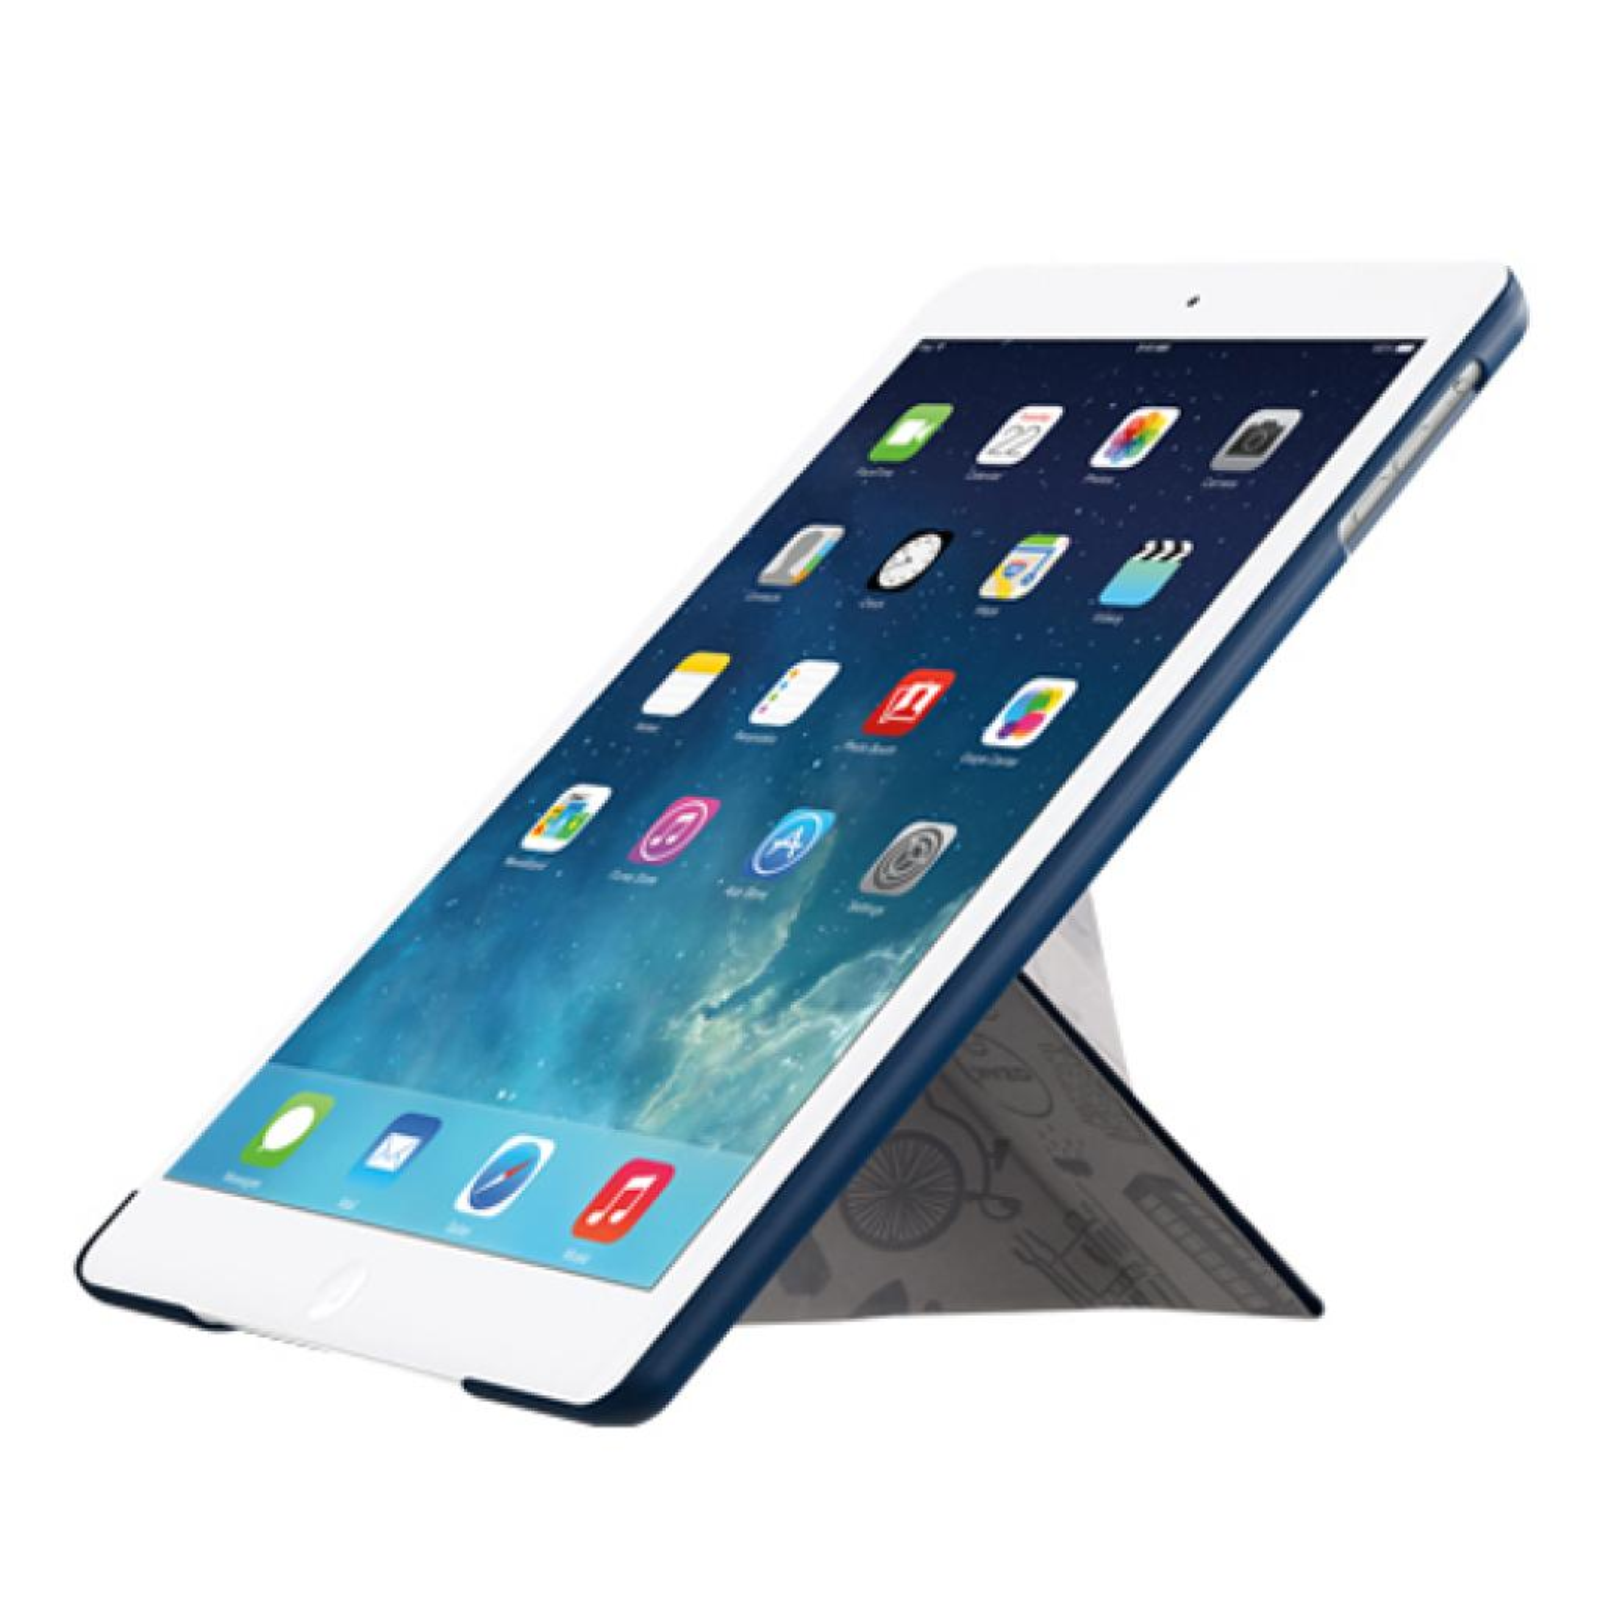 Чехол для планшета OZAKI iPad Air O!coat Travel 360° Multiangle (OC111SY) изображение 2